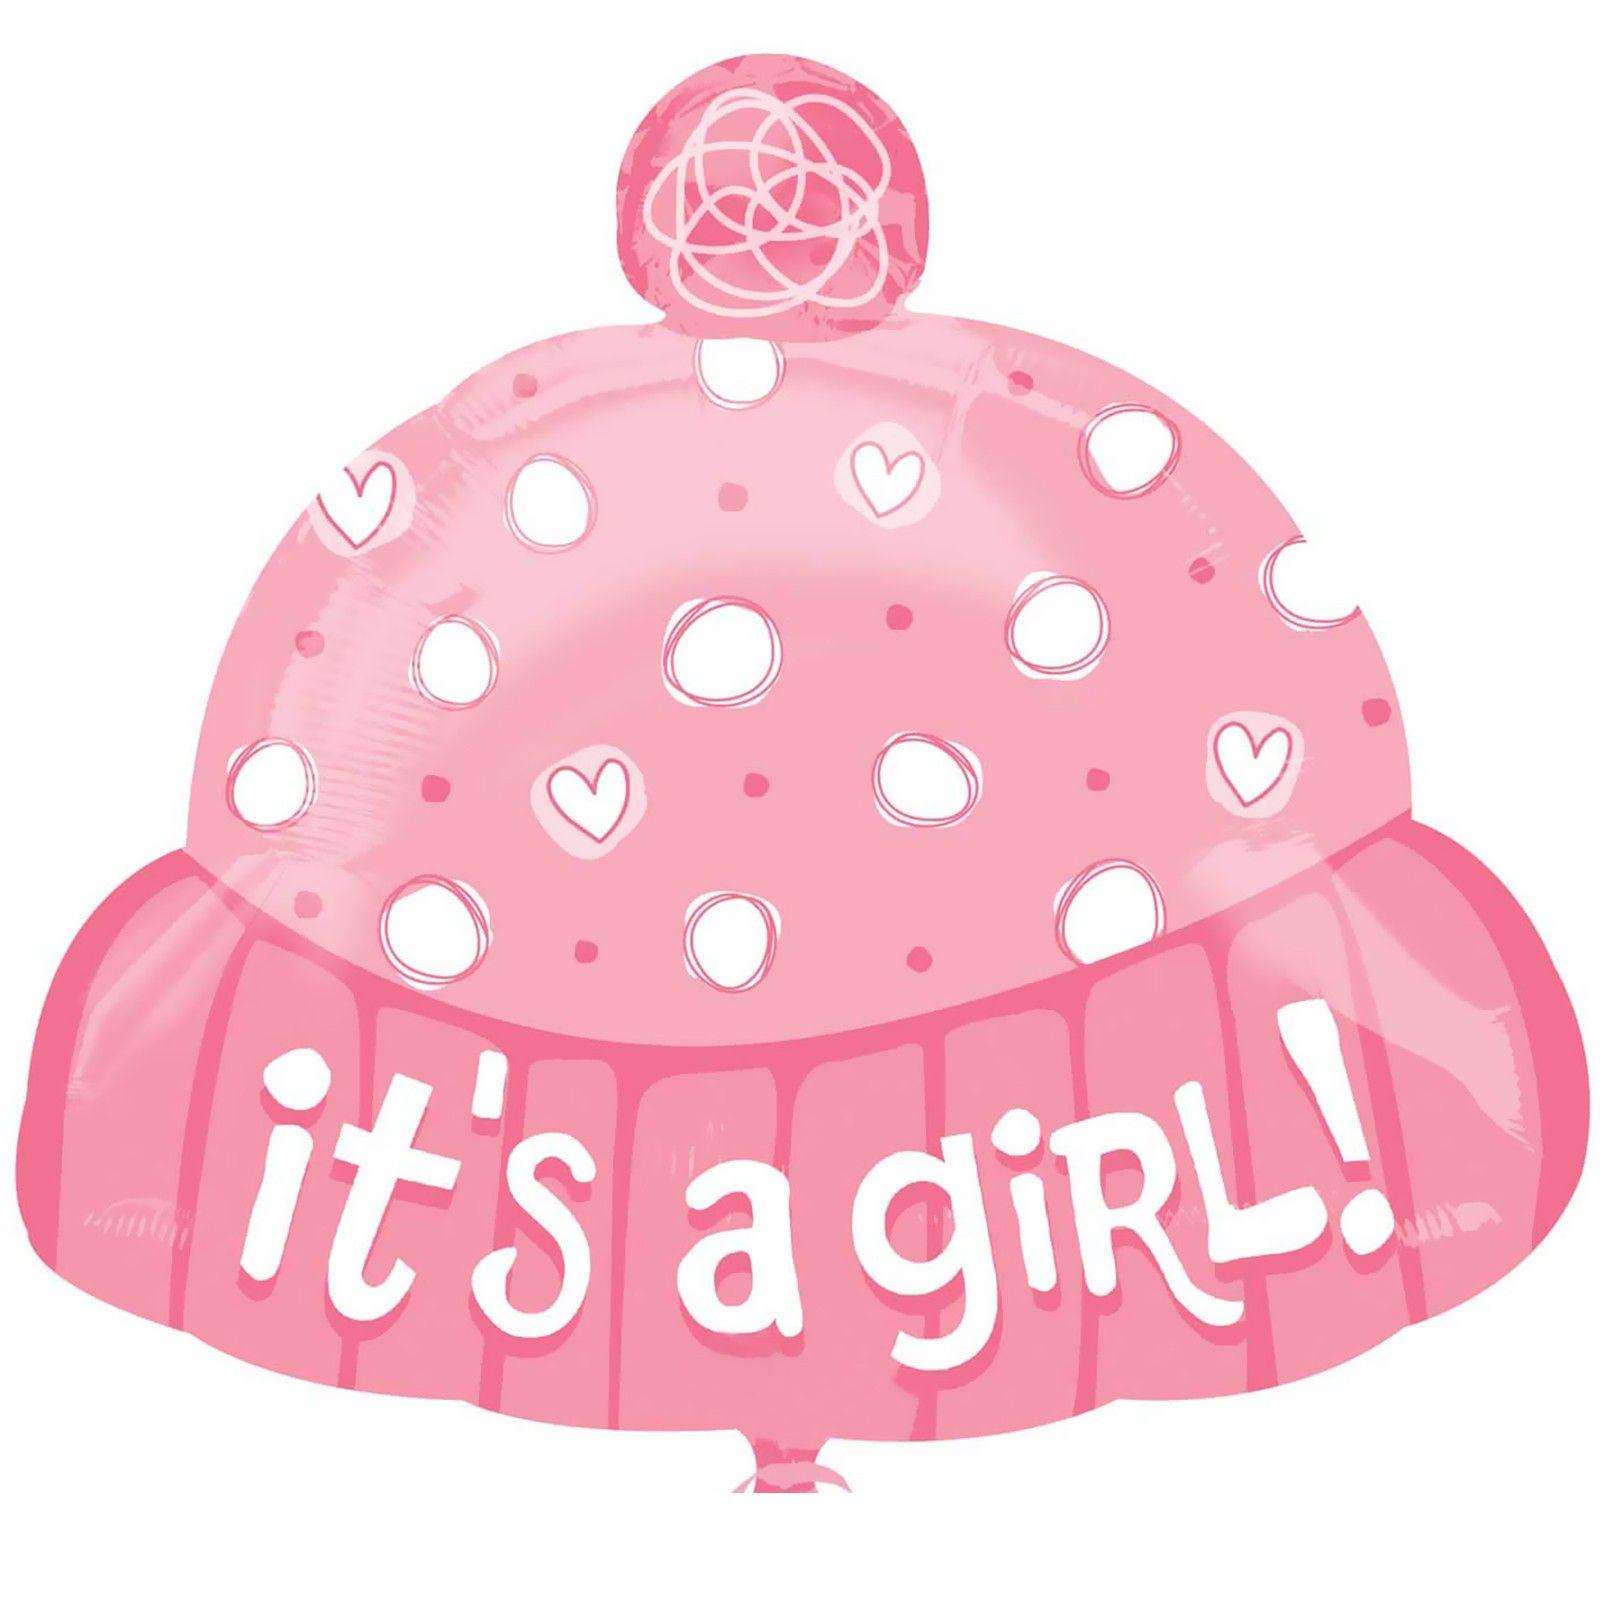 IT'S A GIRL CLIP ART   CLIP ART - BABY - CLIPART ...